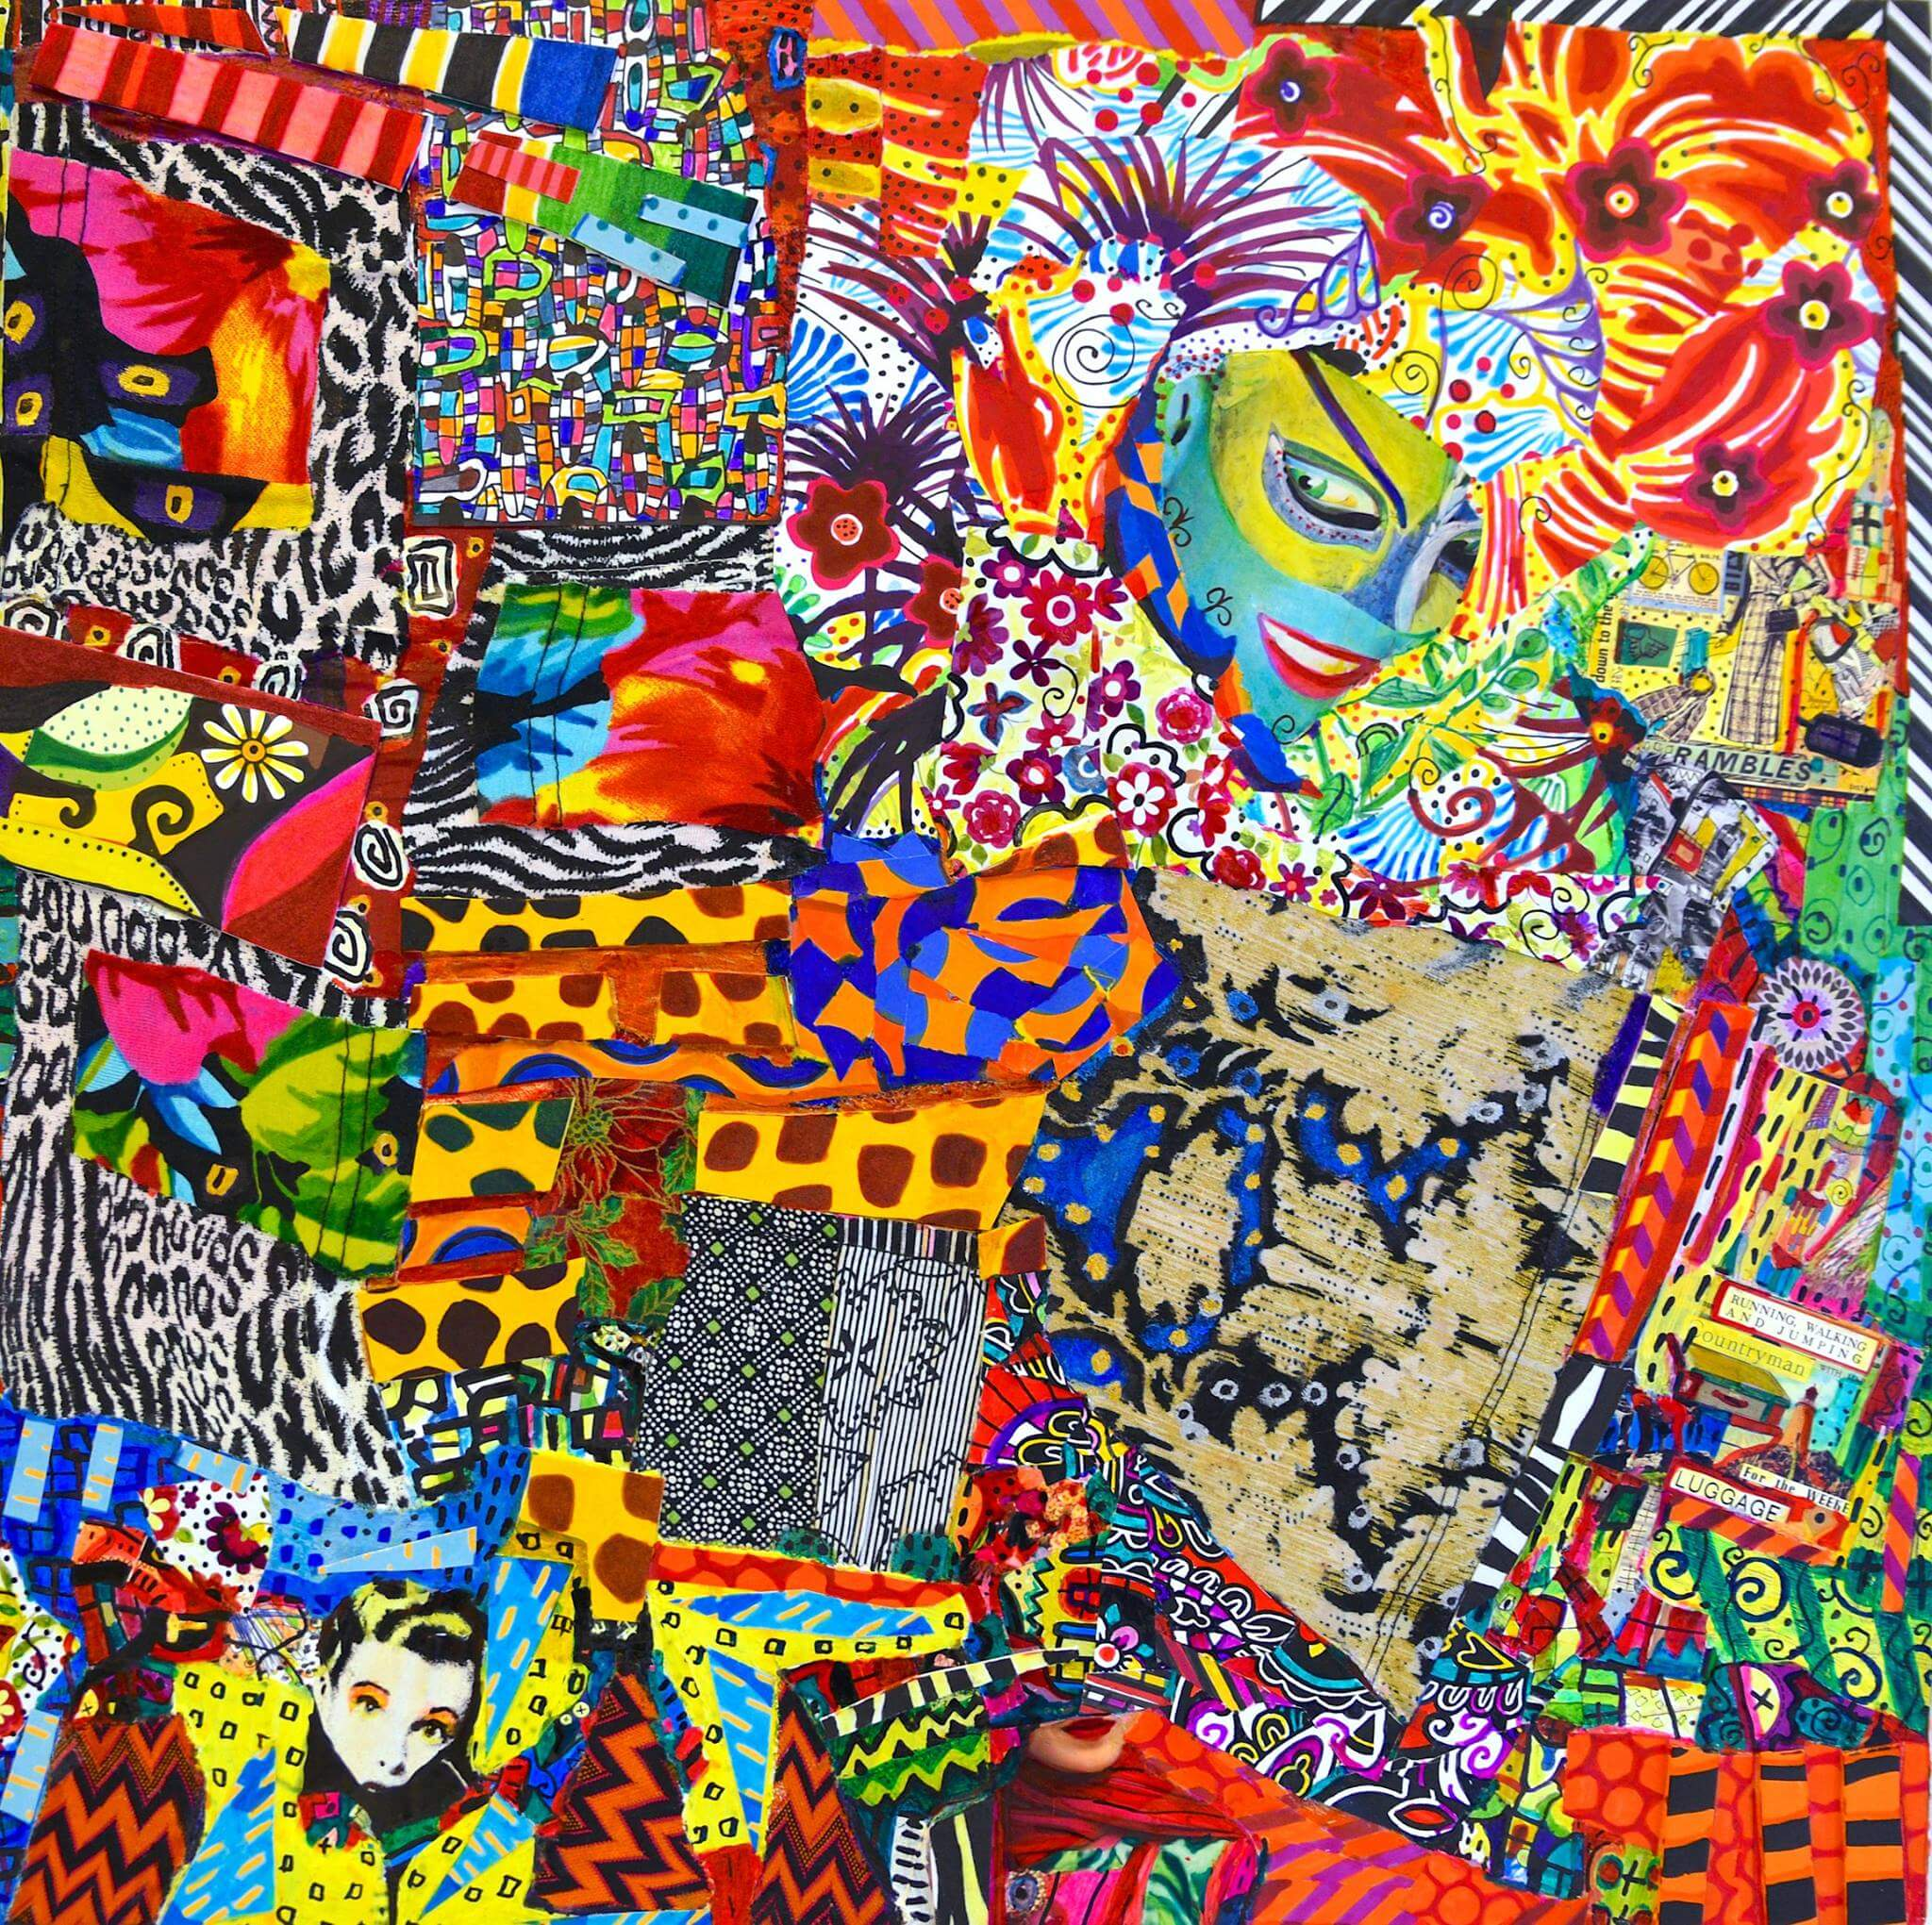 DANIEL MEAKIN, Art of couture. £410.